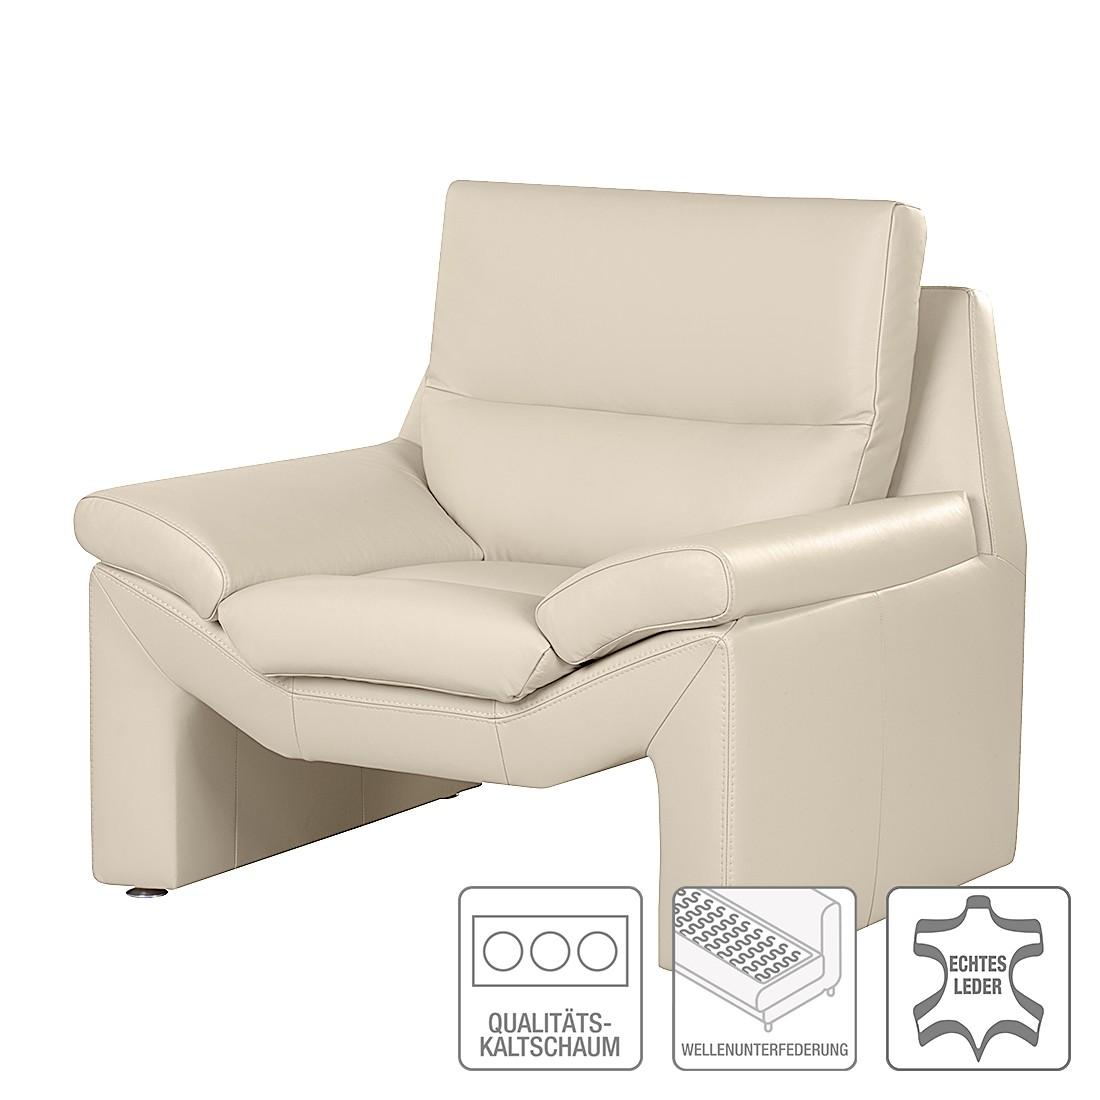 Home 24 - Fauteuil longford - cuir véritable beige, nuovoform